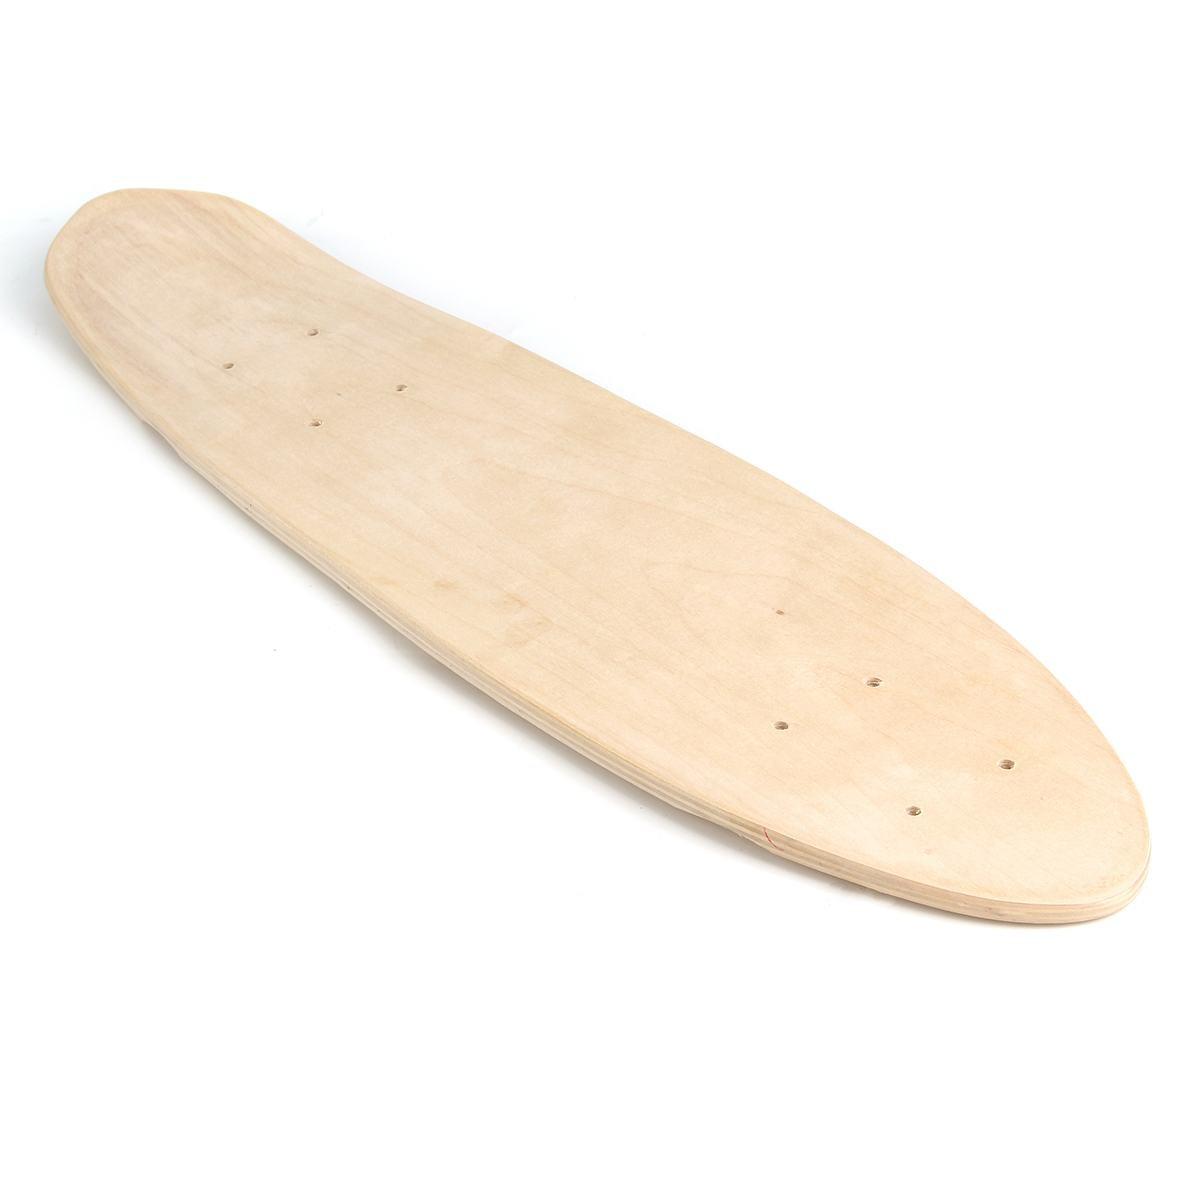 22 Inch Blank Skateboard Deck Natural 55cm Maple Banana Sliding Cruising Skating